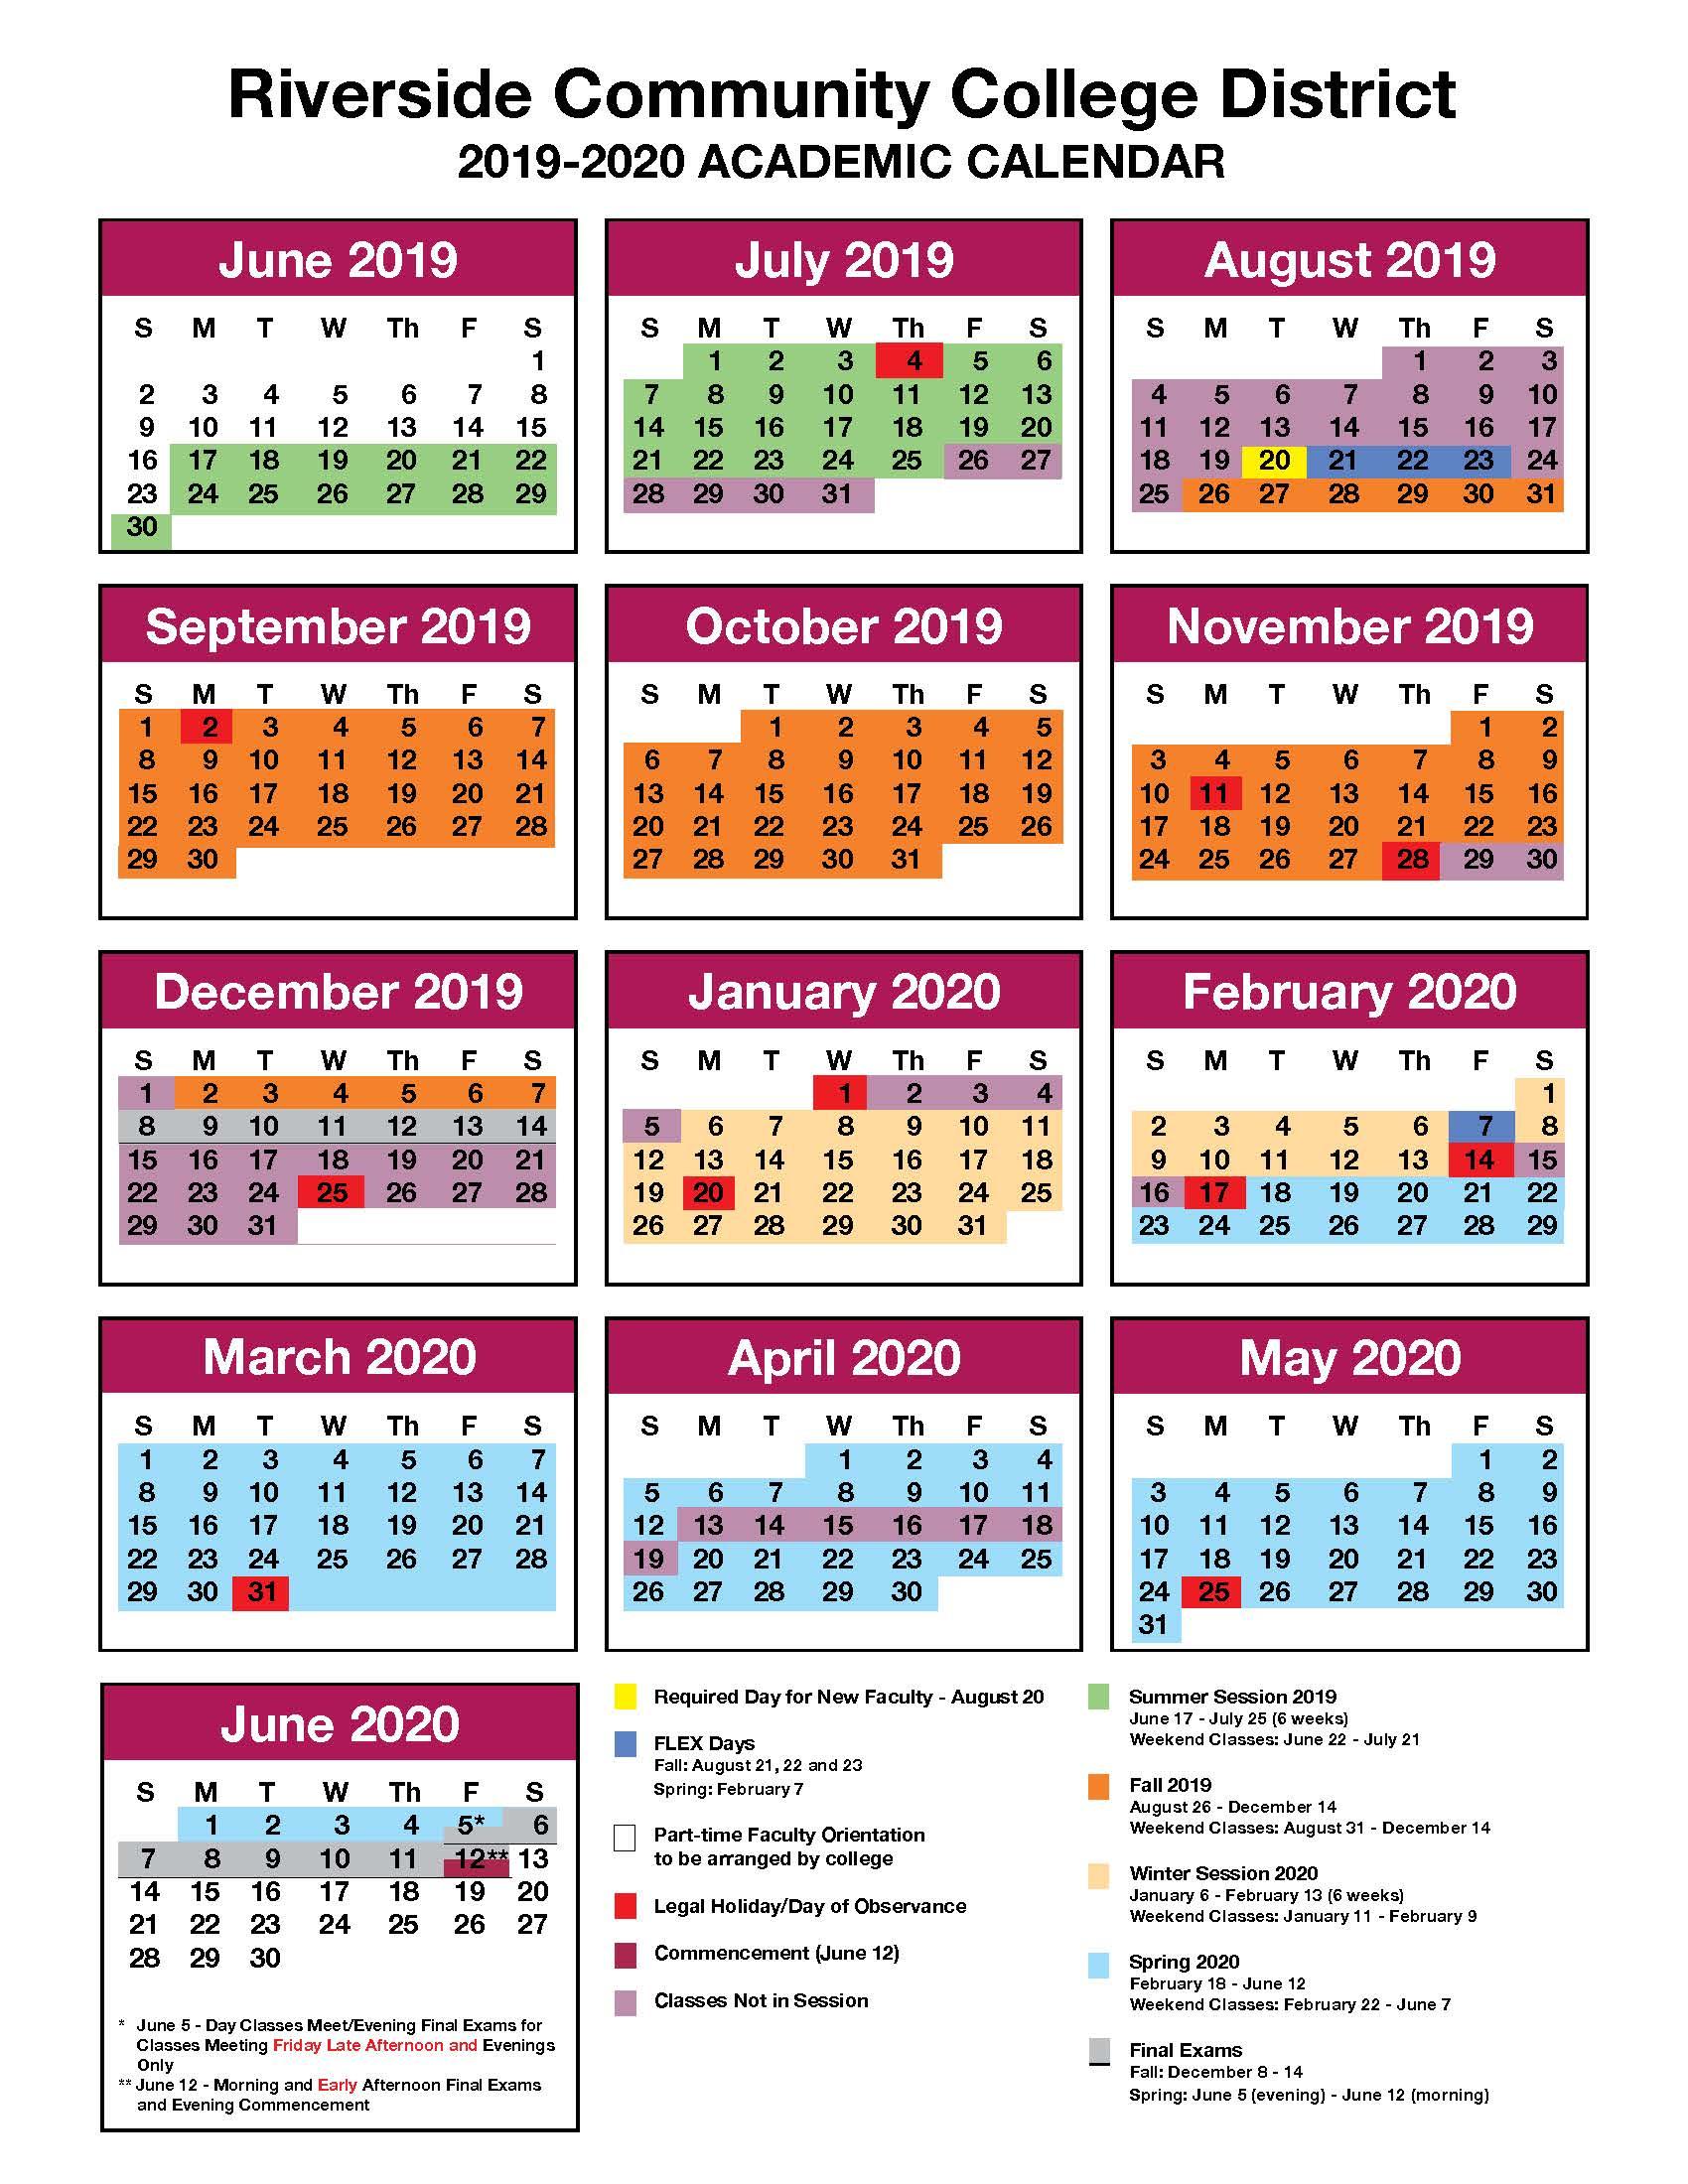 Jfk And Norco College Calendar 2019 2020 - John F. Kennedy With Temecula School District Calendar 2021